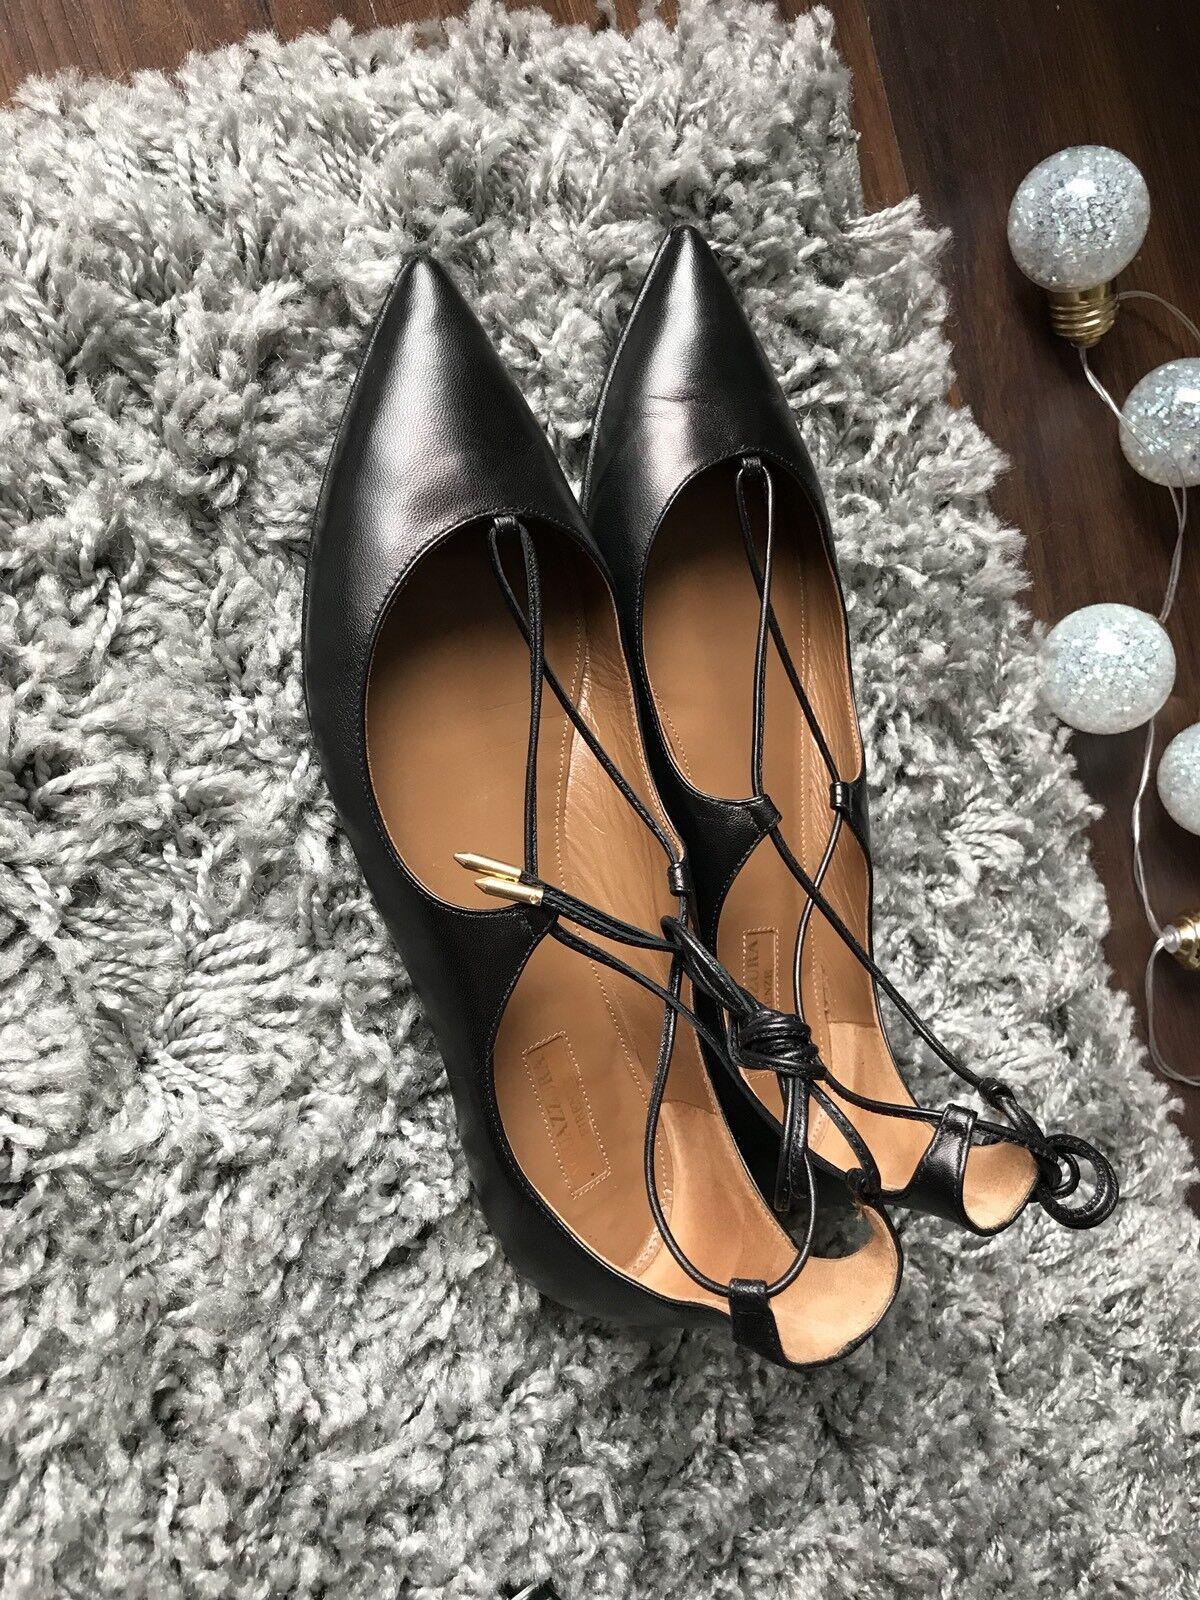 Aquazzura 10 mm Christy Lace-up Nappa Leather Flats Size 39 UK6